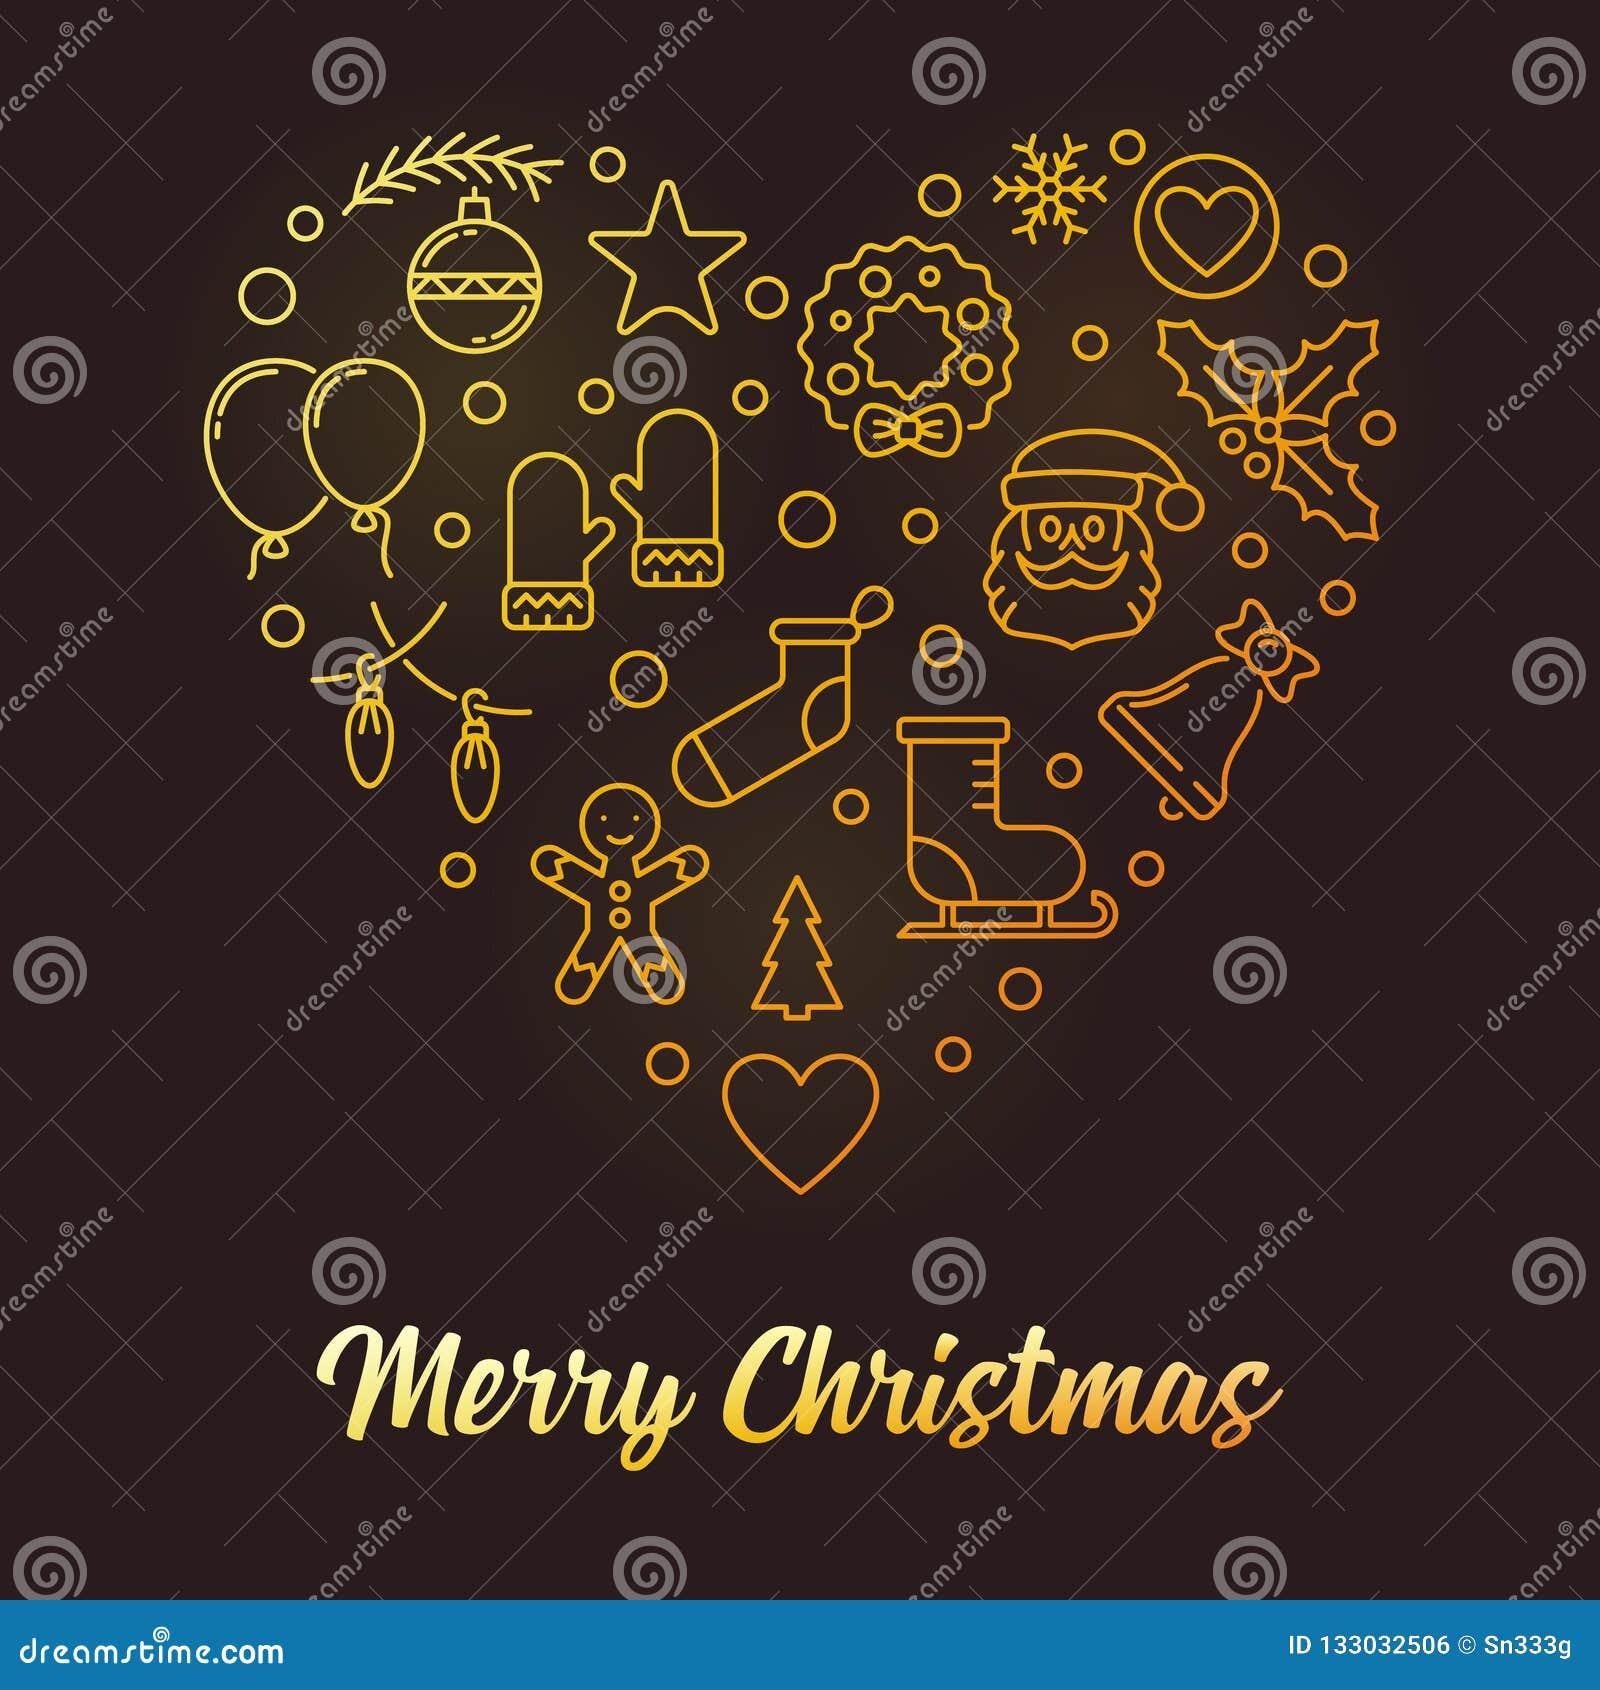 Christmas Heart Vector.Merry Christmas Heart Vector Golden Xmas Line Illustration